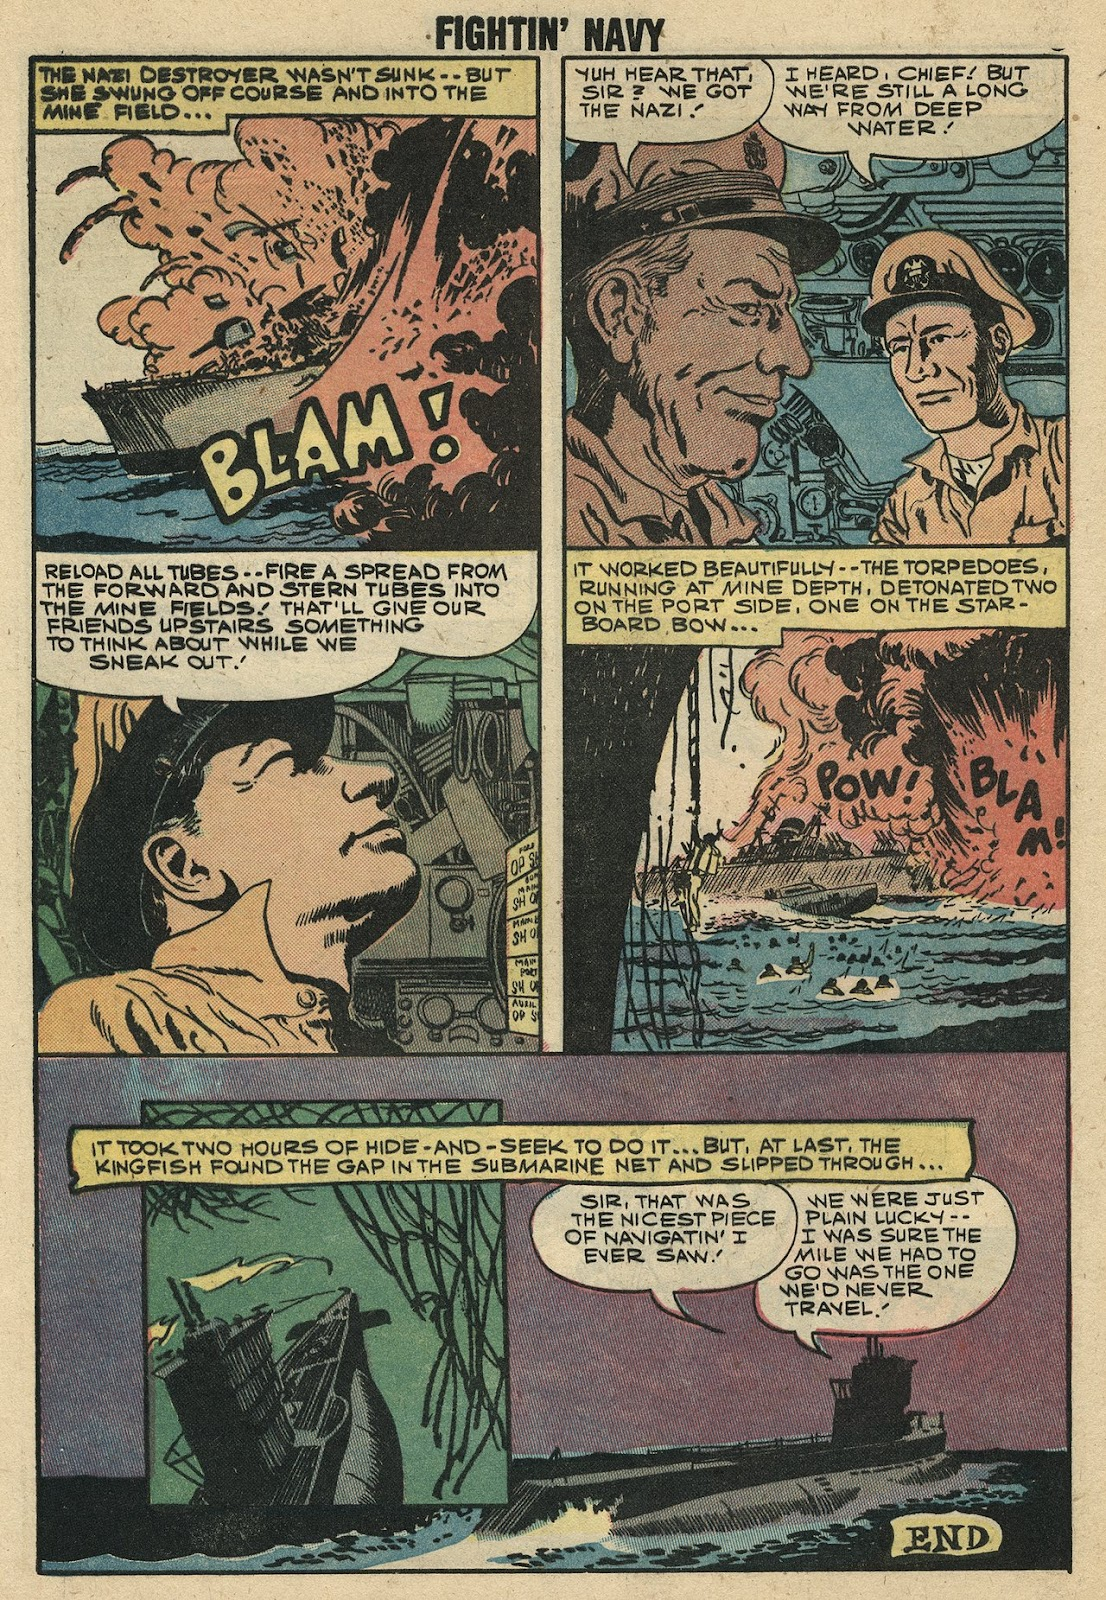 Read online Fightin' Navy comic -  Issue #86 - 8